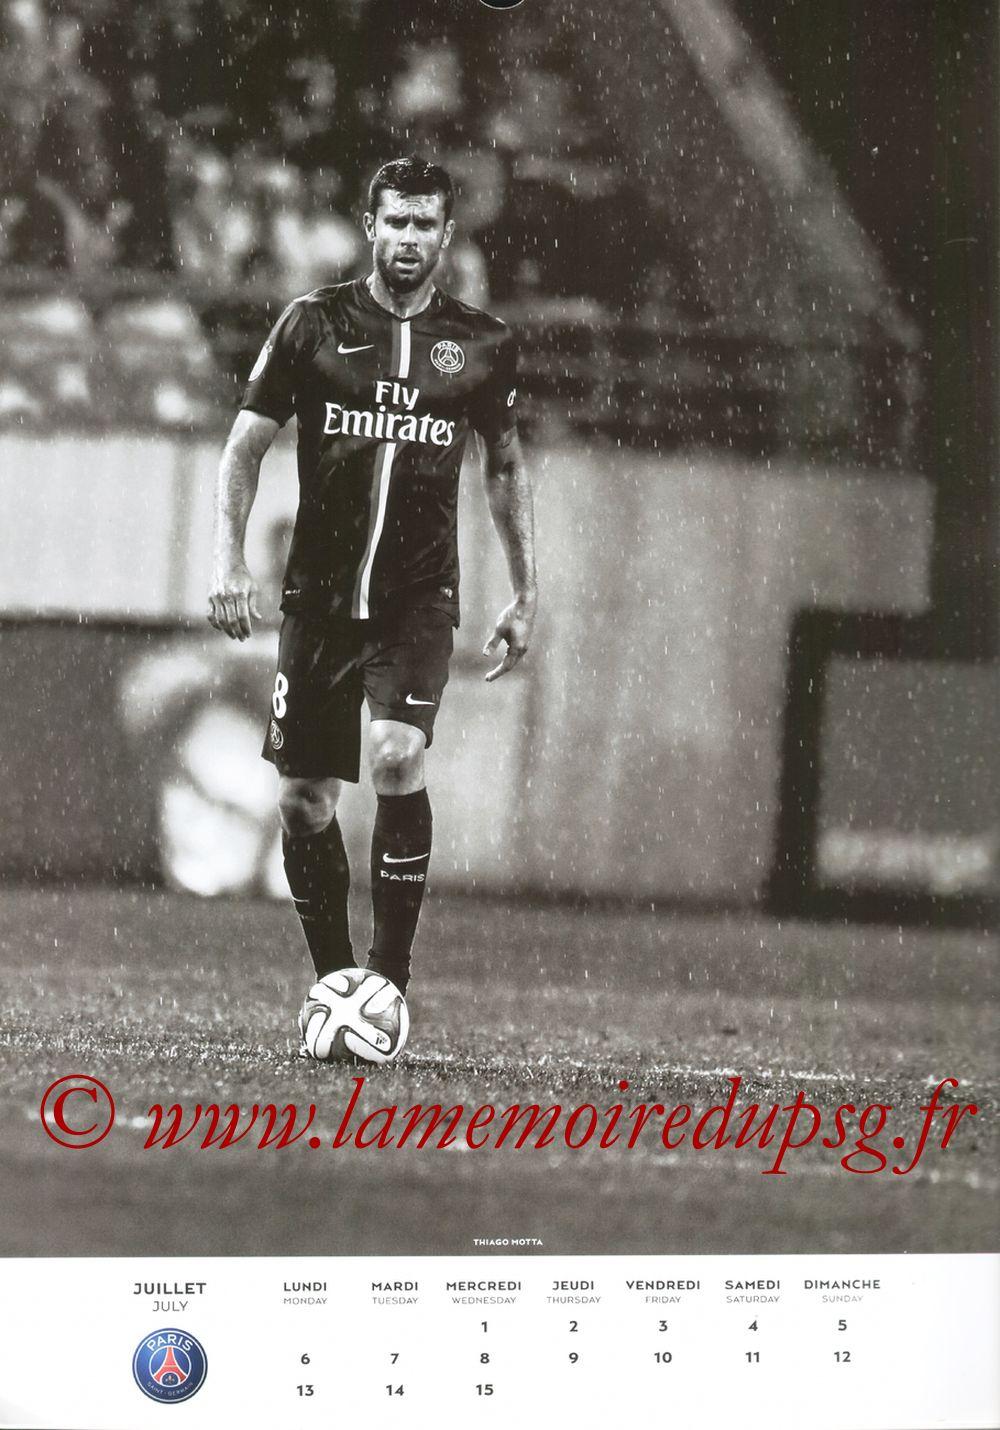 Calendrier PSG 2015 - Page 13 - Thiago MOTTA